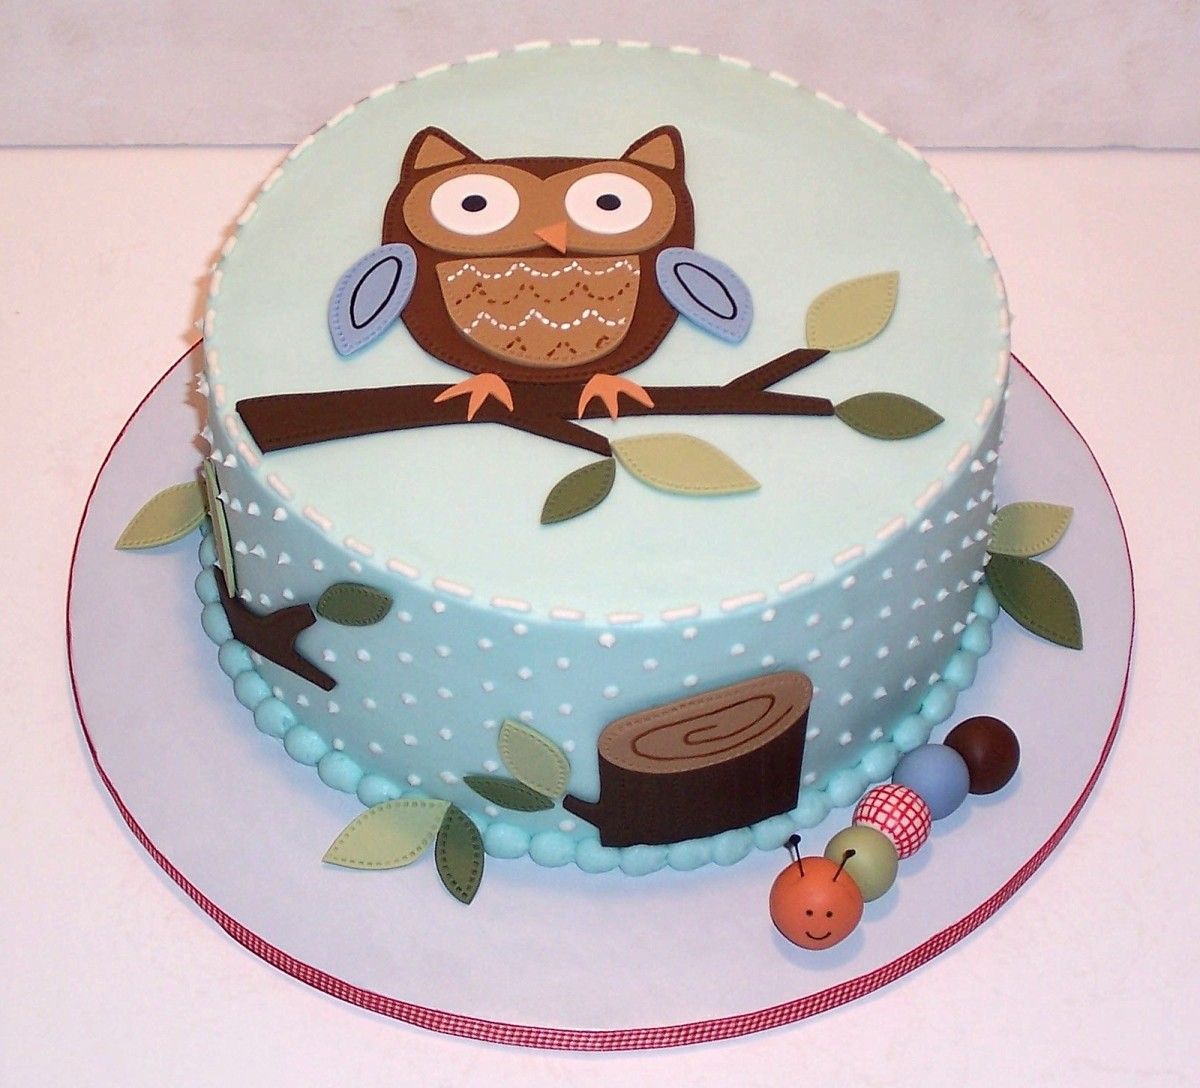 Blue Owl Shower Cake (http://marj-theicingonthecake.blogspot.com/2011/02/baby-owl.html)